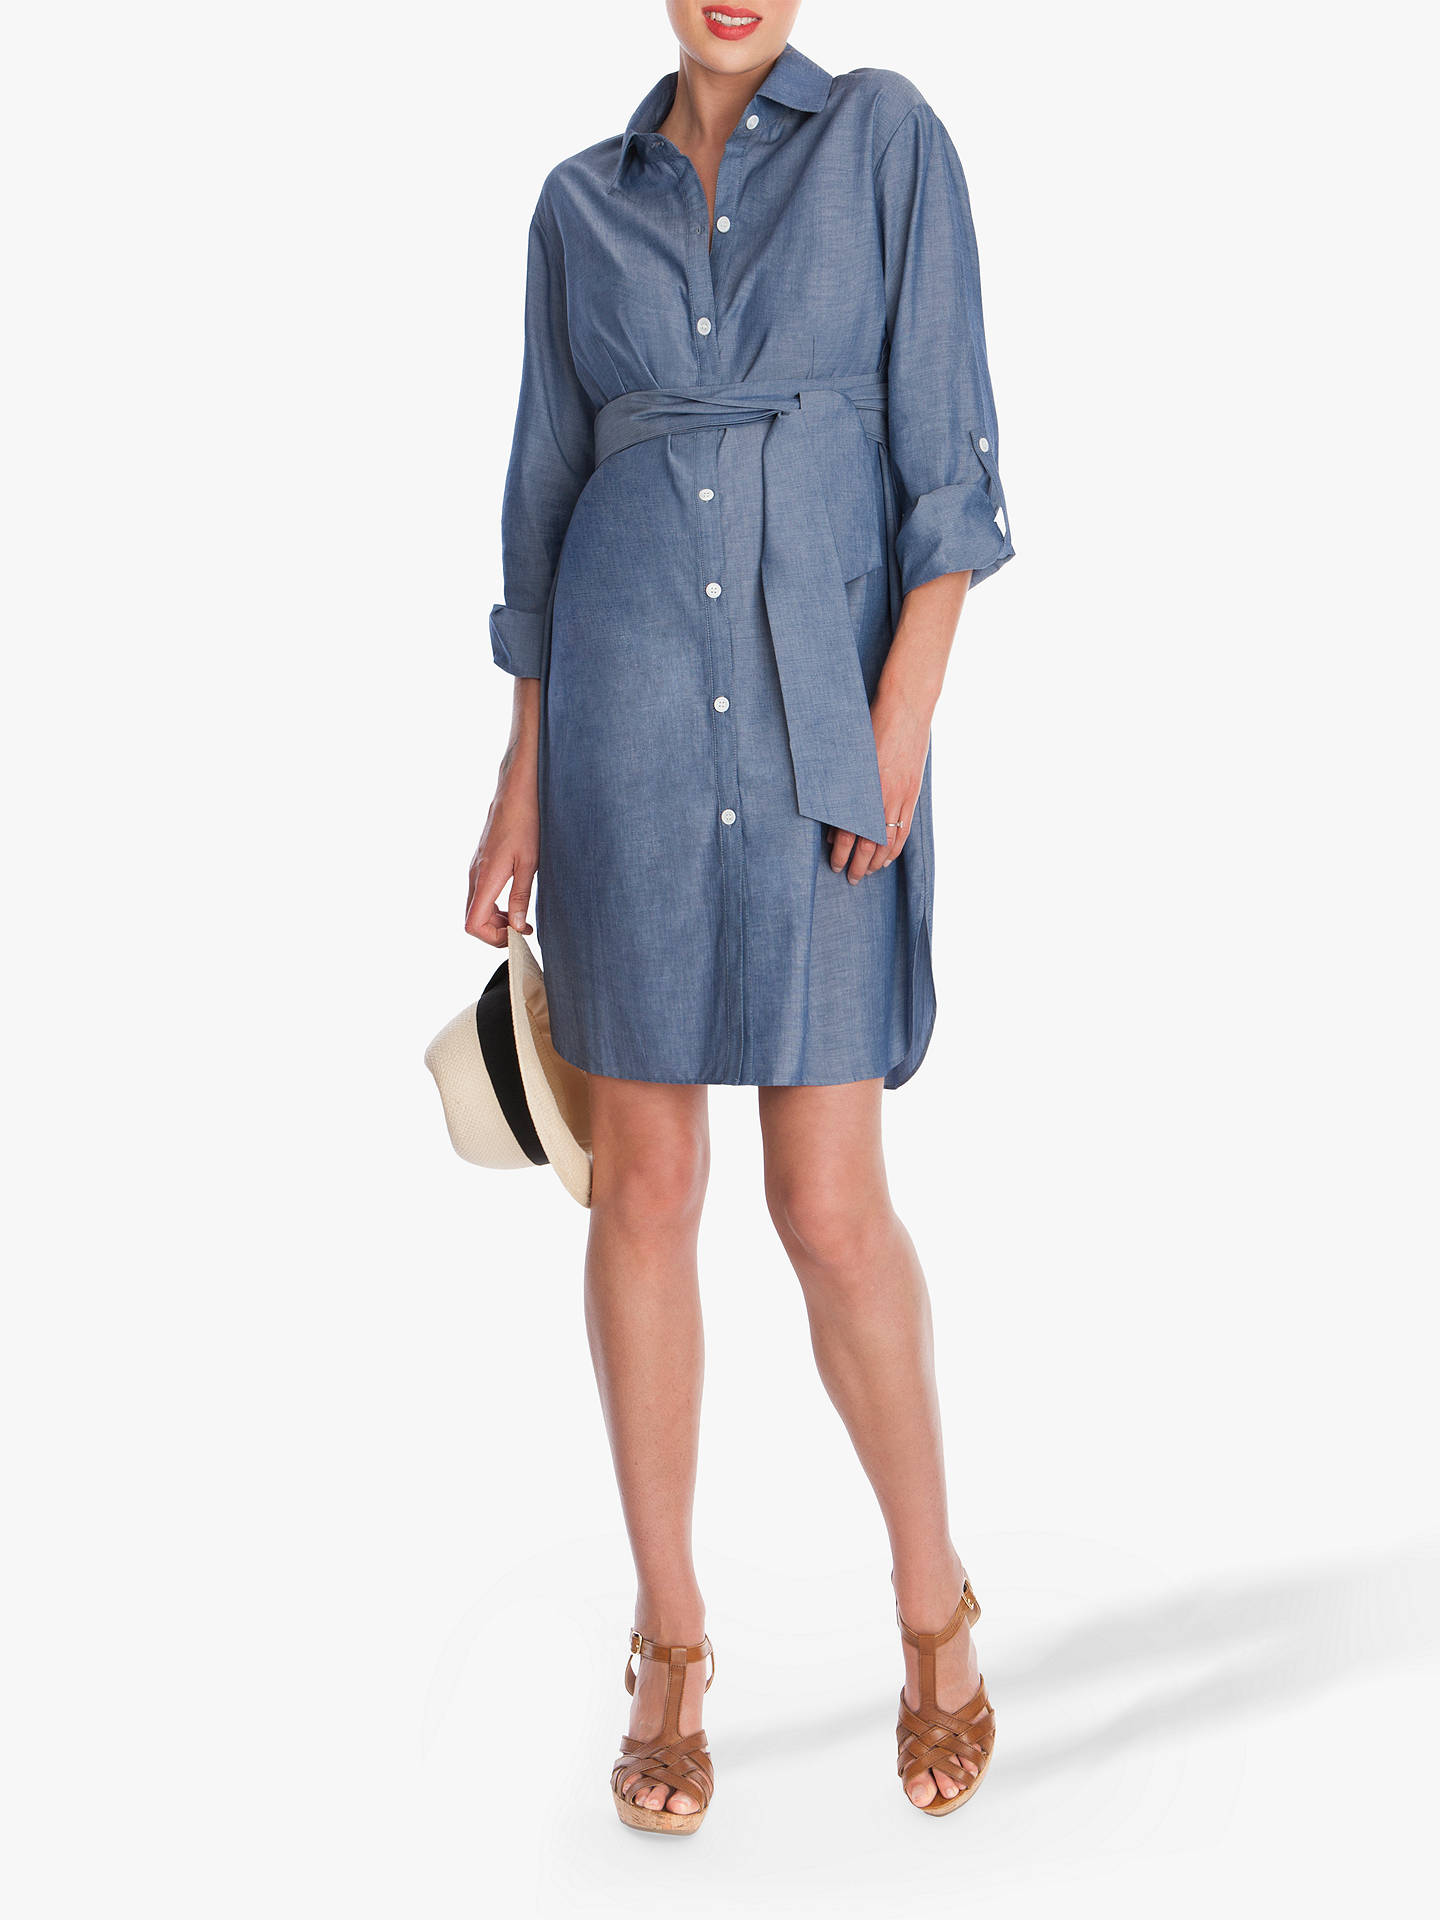 cea2d475a36aa Buy Séraphine Abalina Shirt Denim Maternity Dress, Blue, 10 Online at  johnlewis.com ...